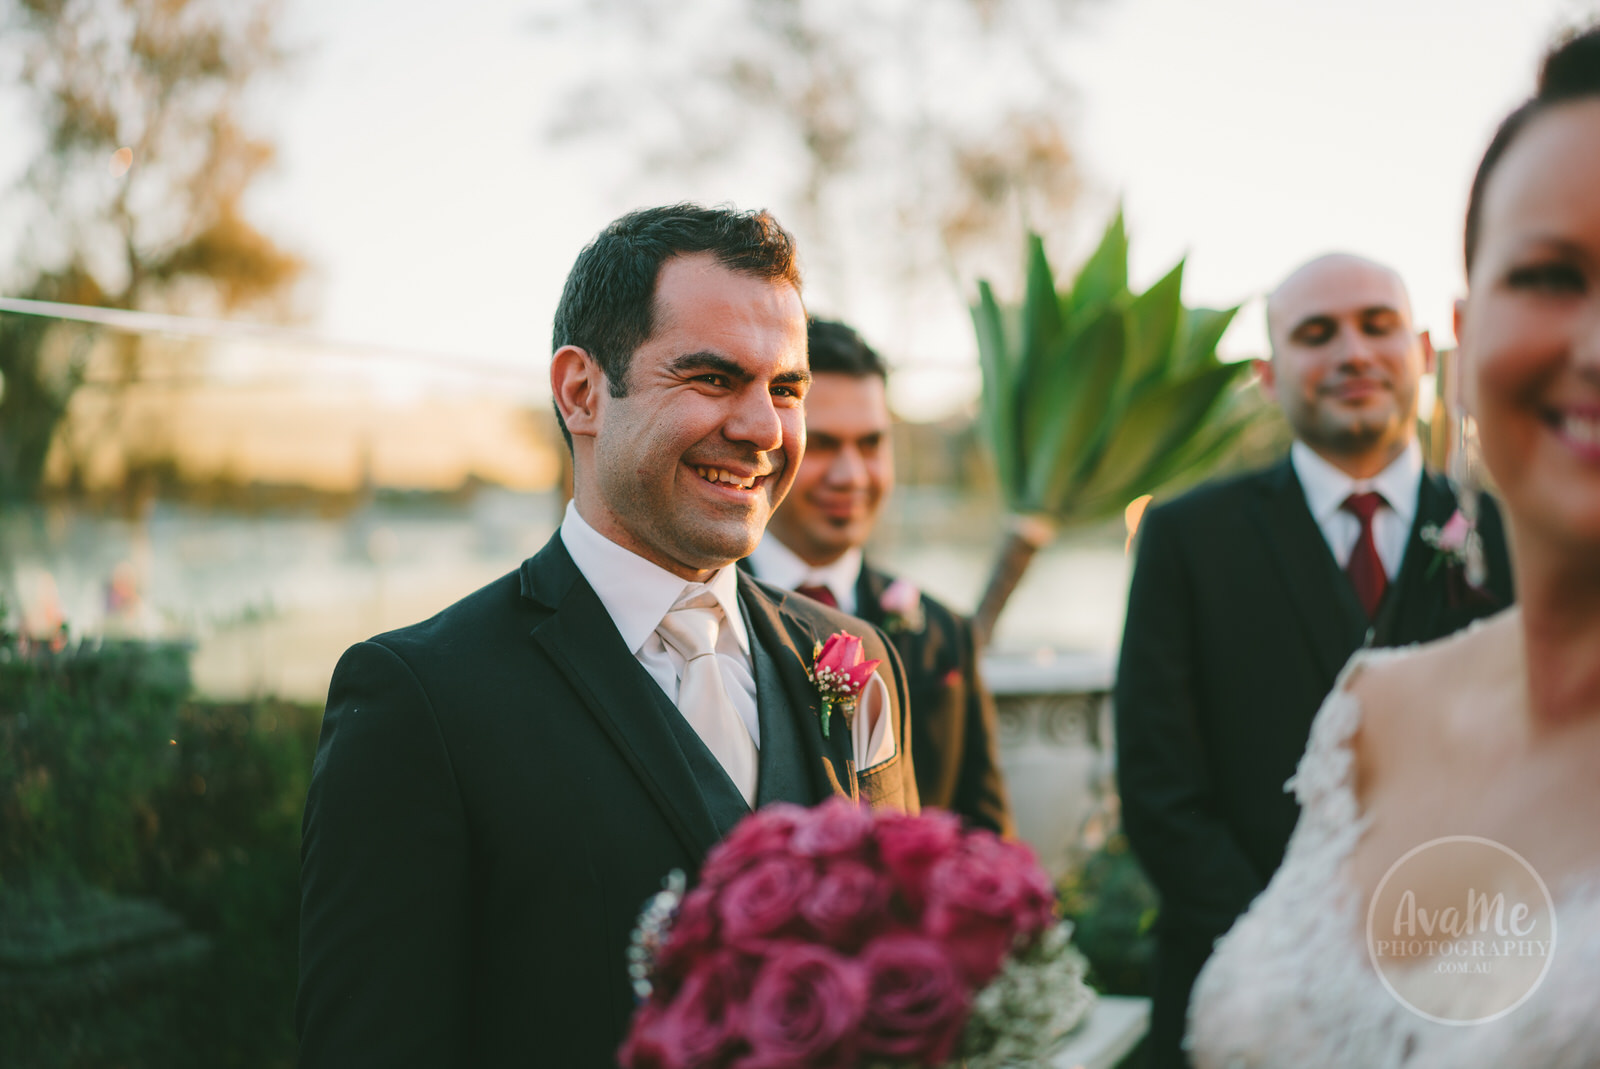 lauren-mo-bicentennial-park-la-montage-wedding-129